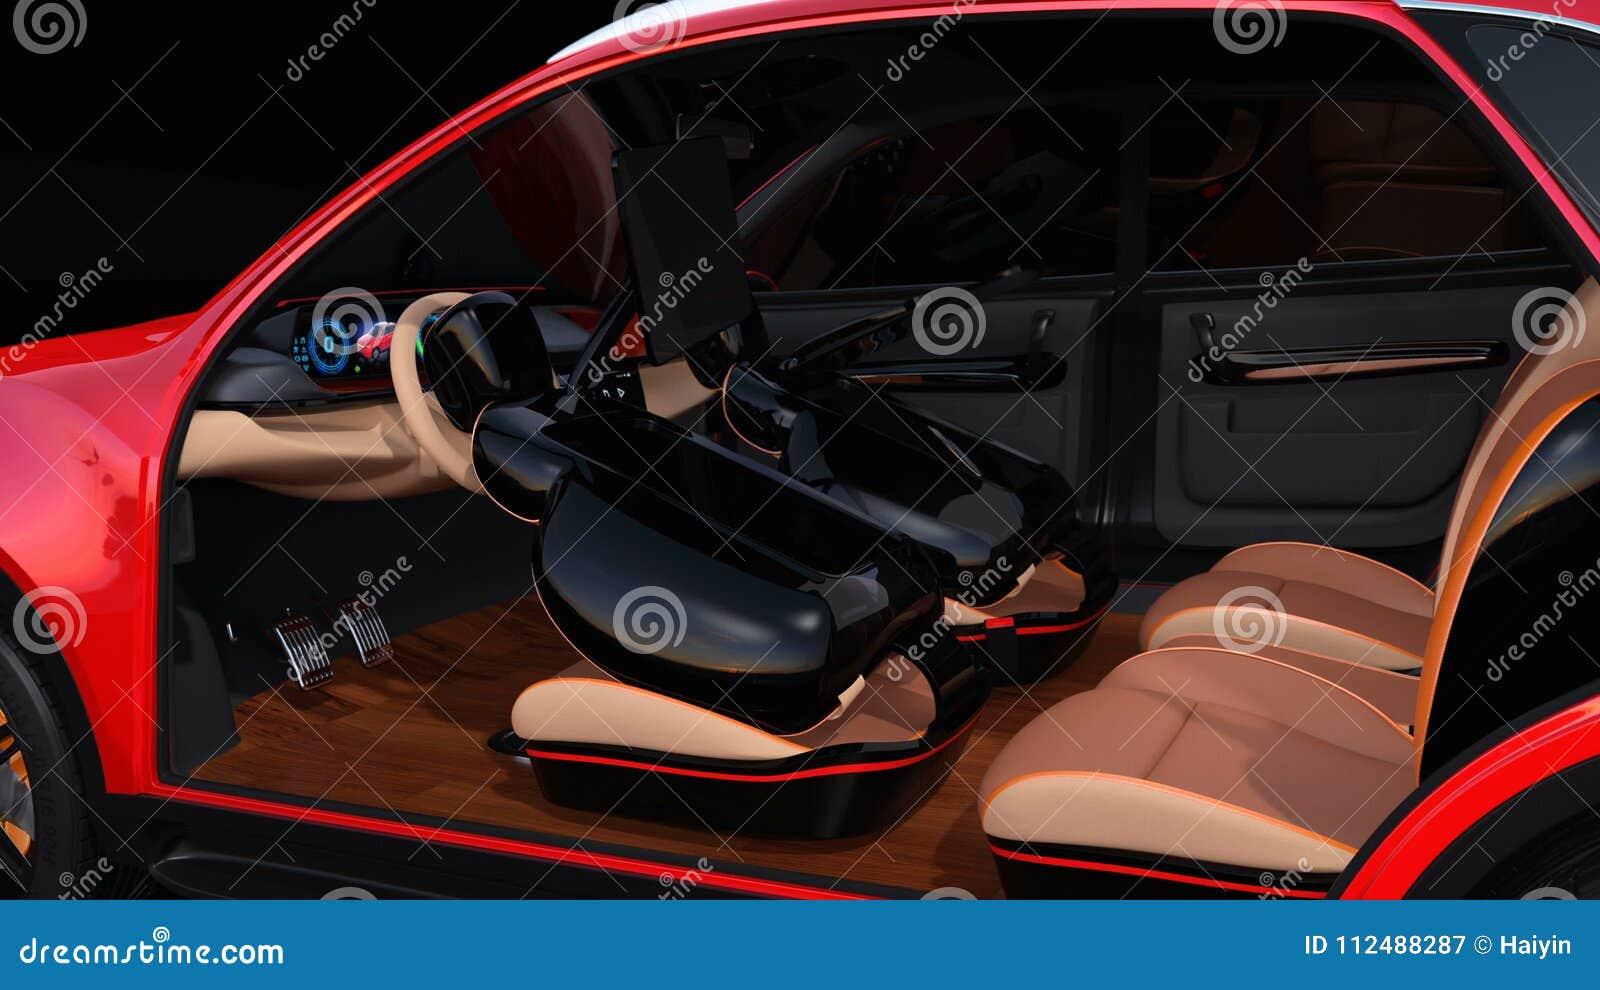 Electric self driving suv car interior design stock video video of electric self driving suv car interior design stock video video of ecology flooring 112488287 solutioingenieria Choice Image